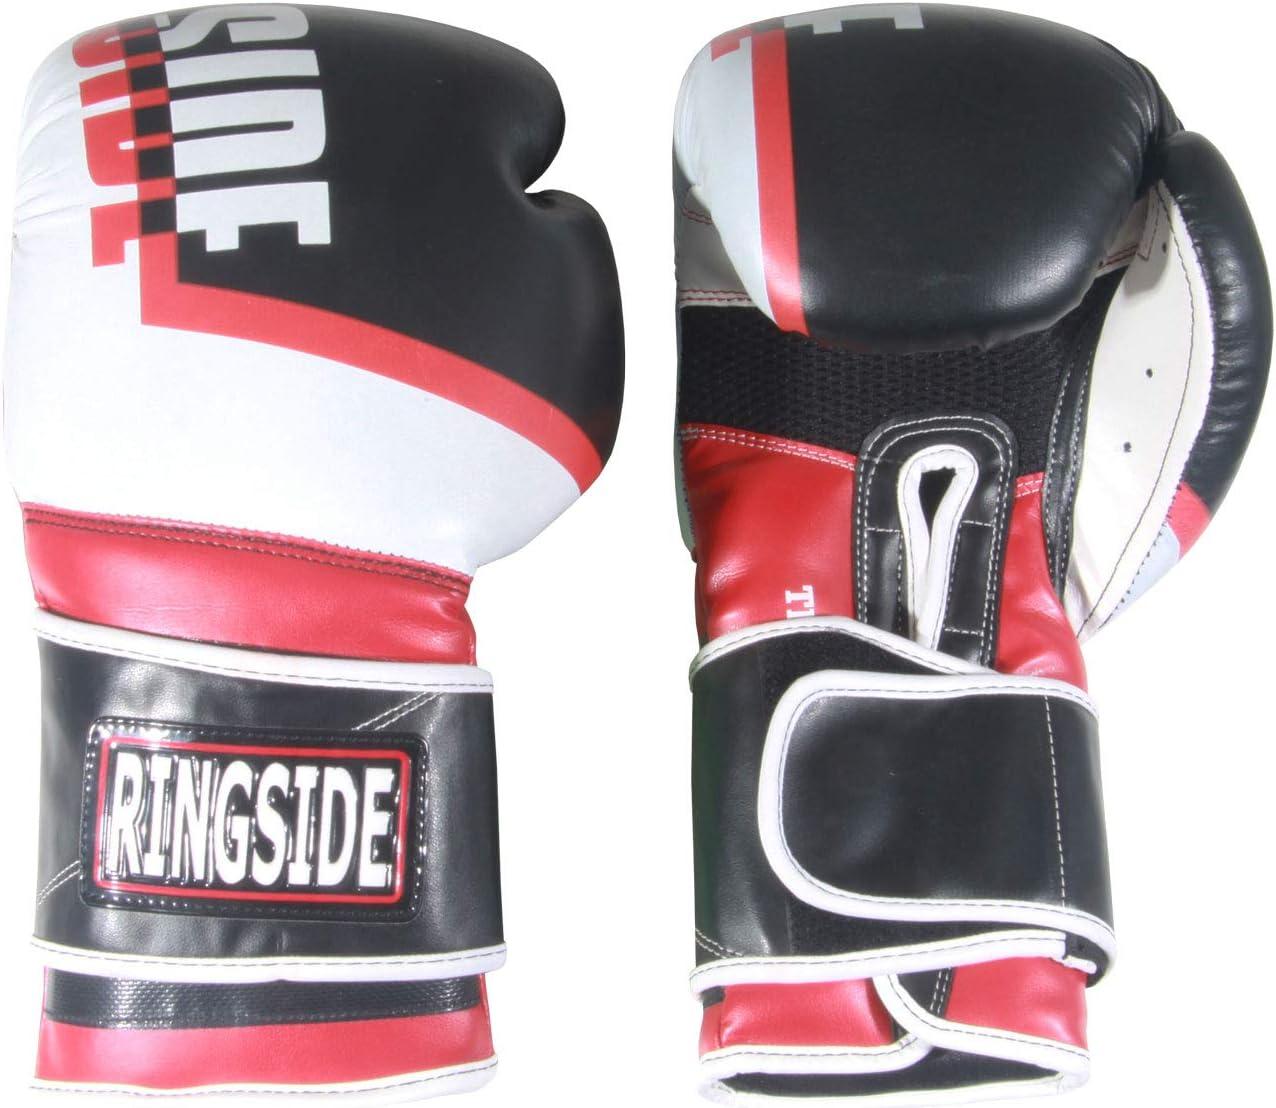 Ringside Bullet Sparring Glove